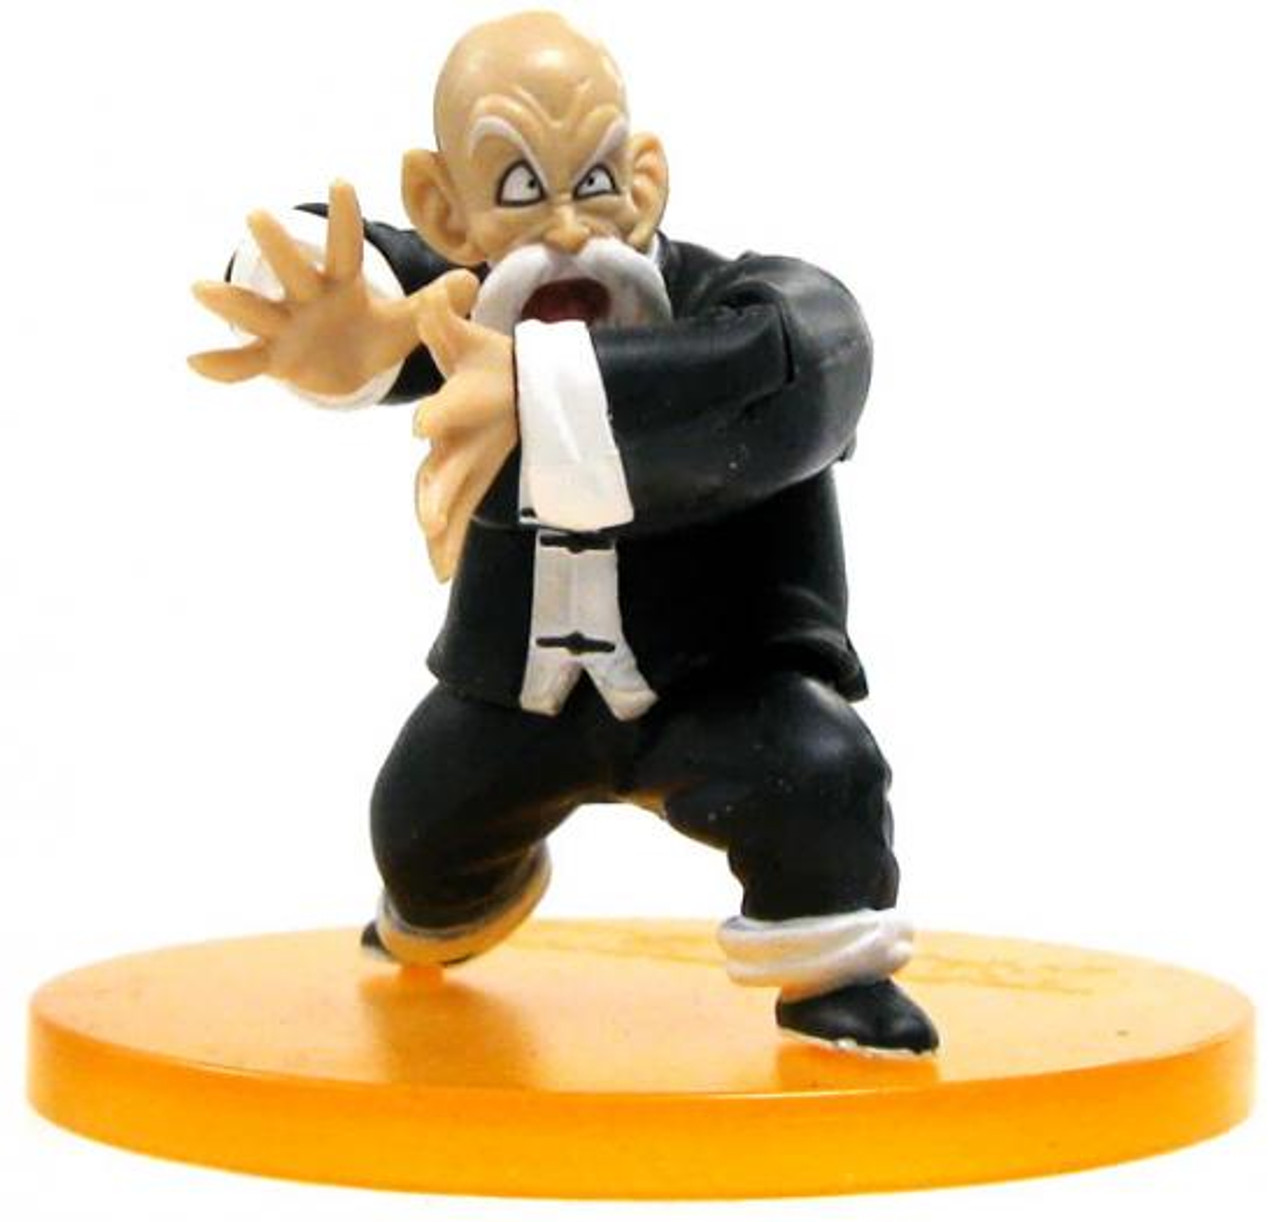 Dragon Ball Z Japanese Limited Articulation Master Roshi 3-Inch Figure [Hands Together]